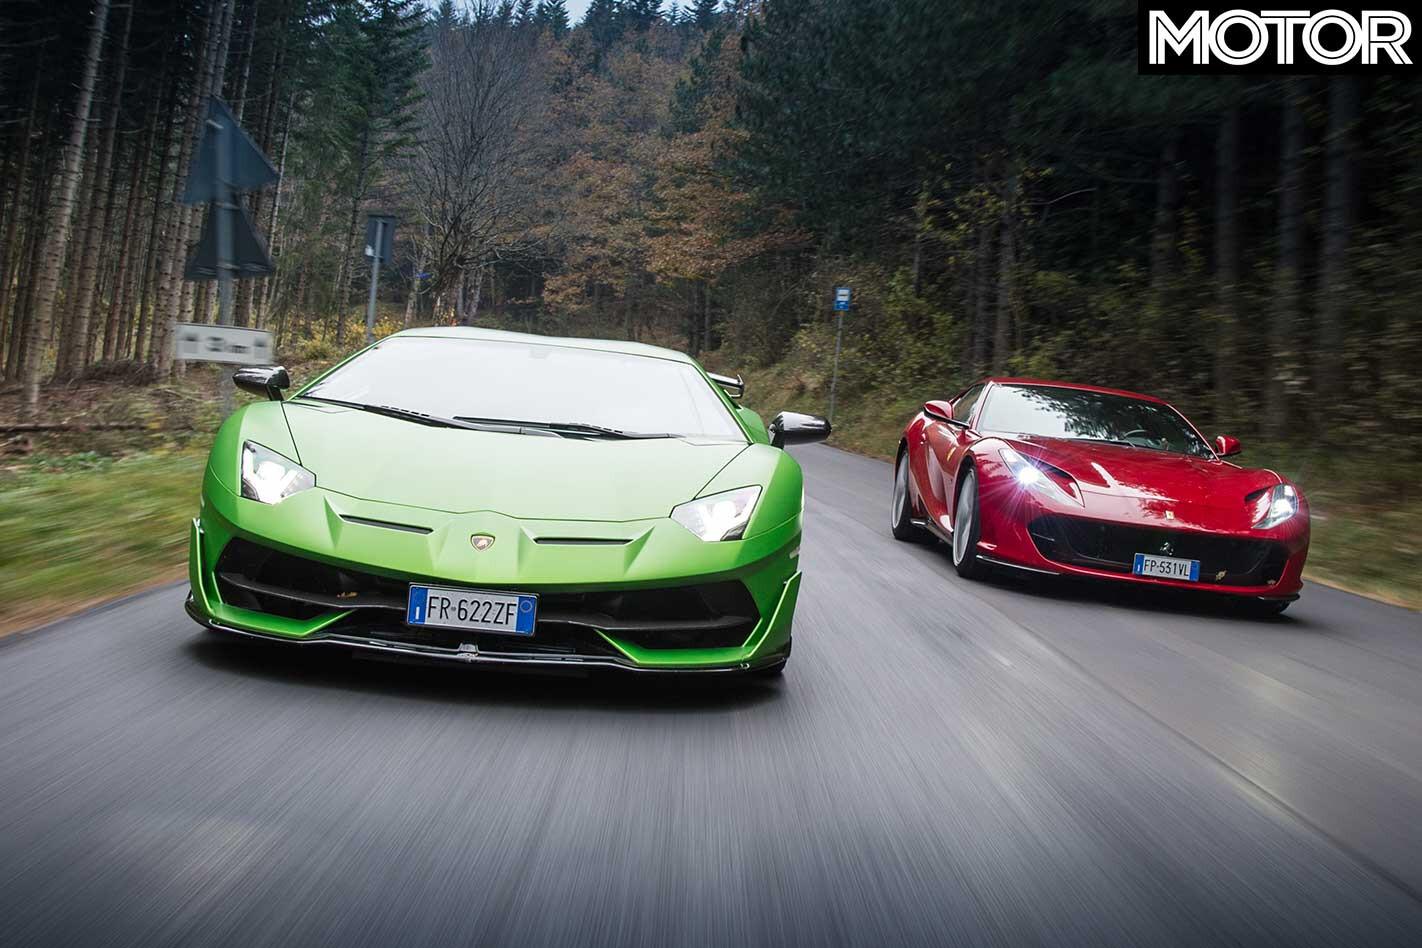 2019 Lamborghini Aventador SVJ Vs Ferrari 812 Superfast Performance Comparison Specifications Jpg